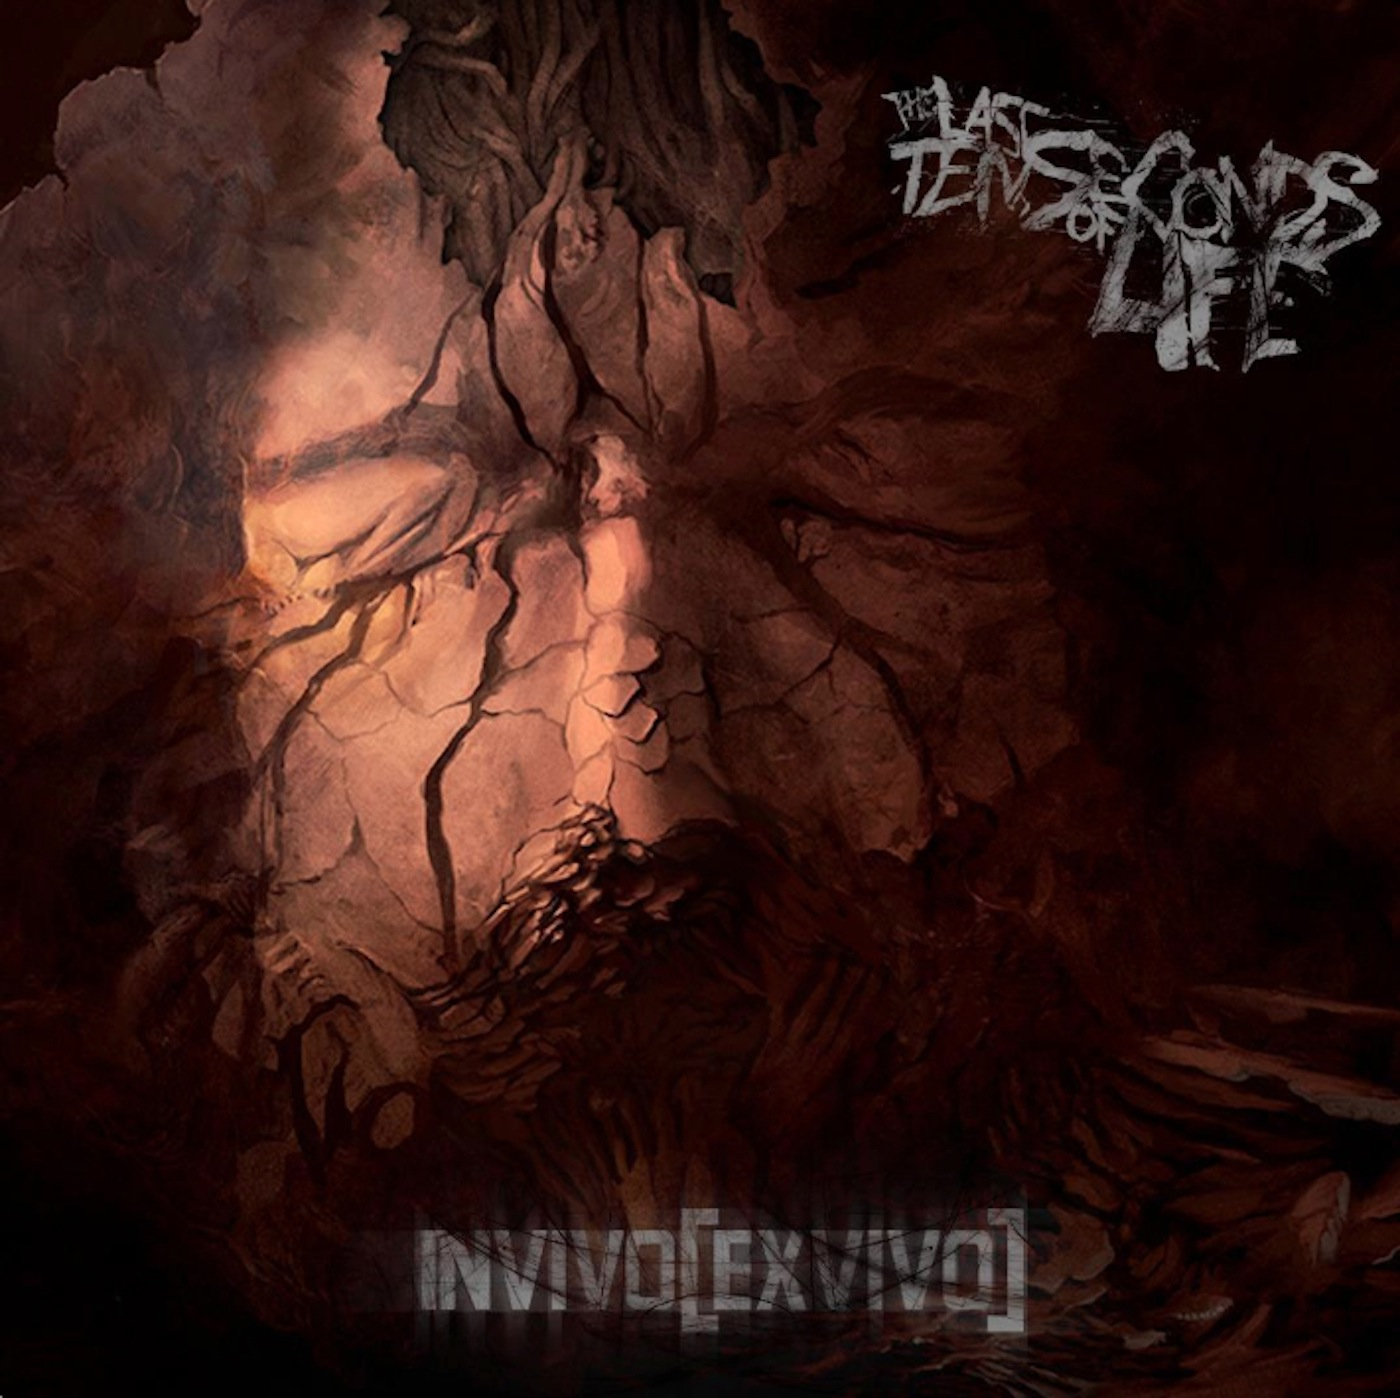 INVIVO[EXVIVO] - 2013